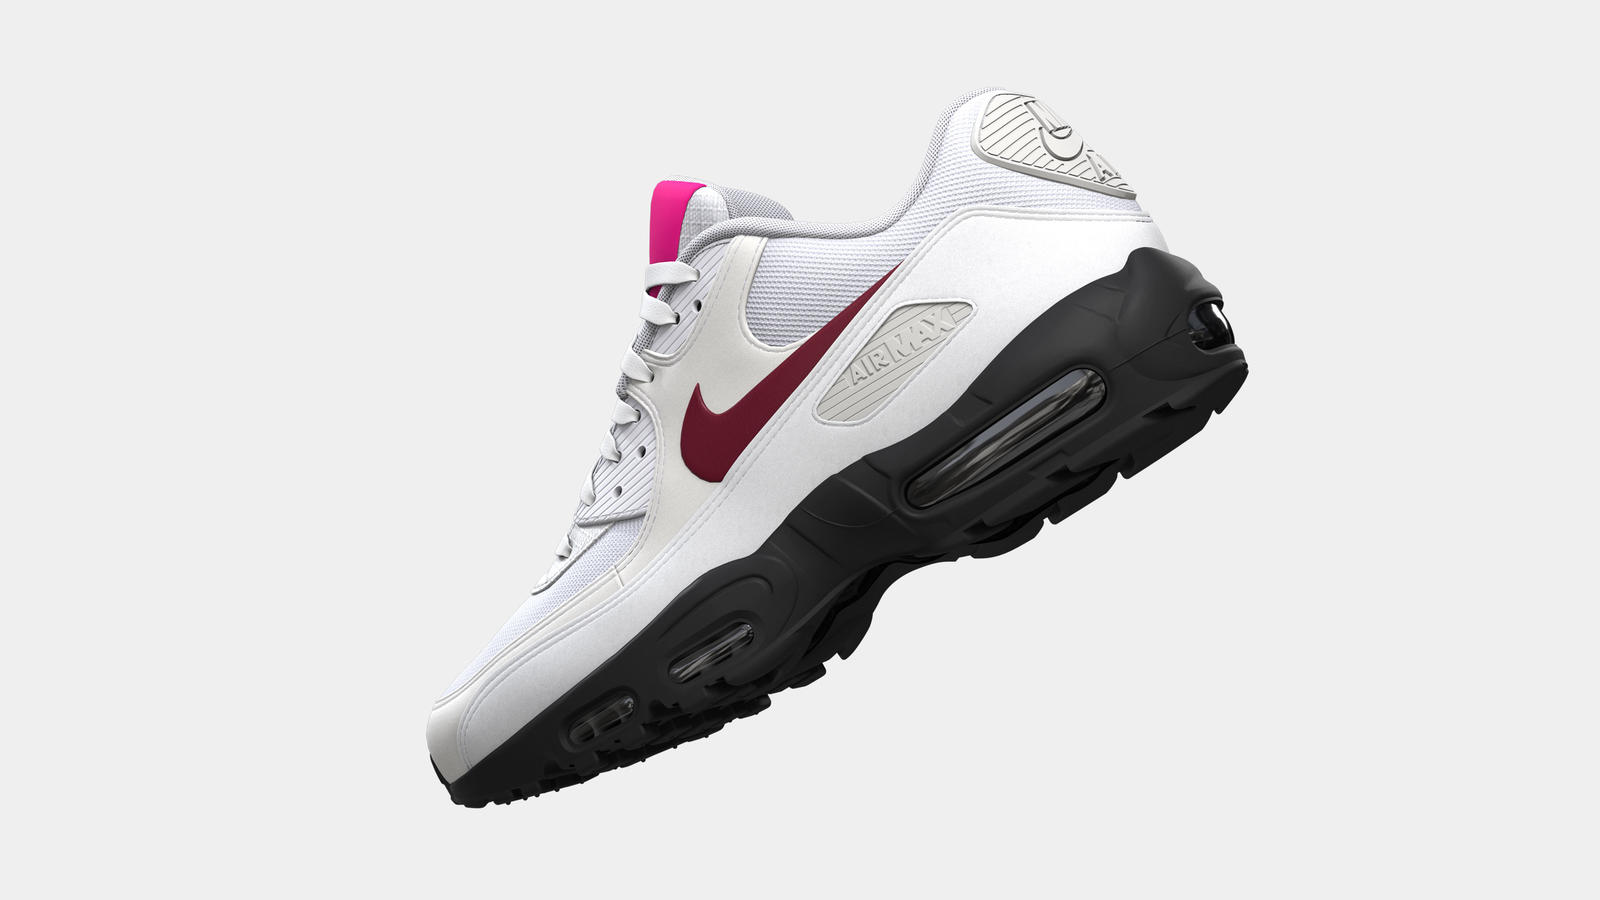 Nike patta nikebyyou 5 hd 1600